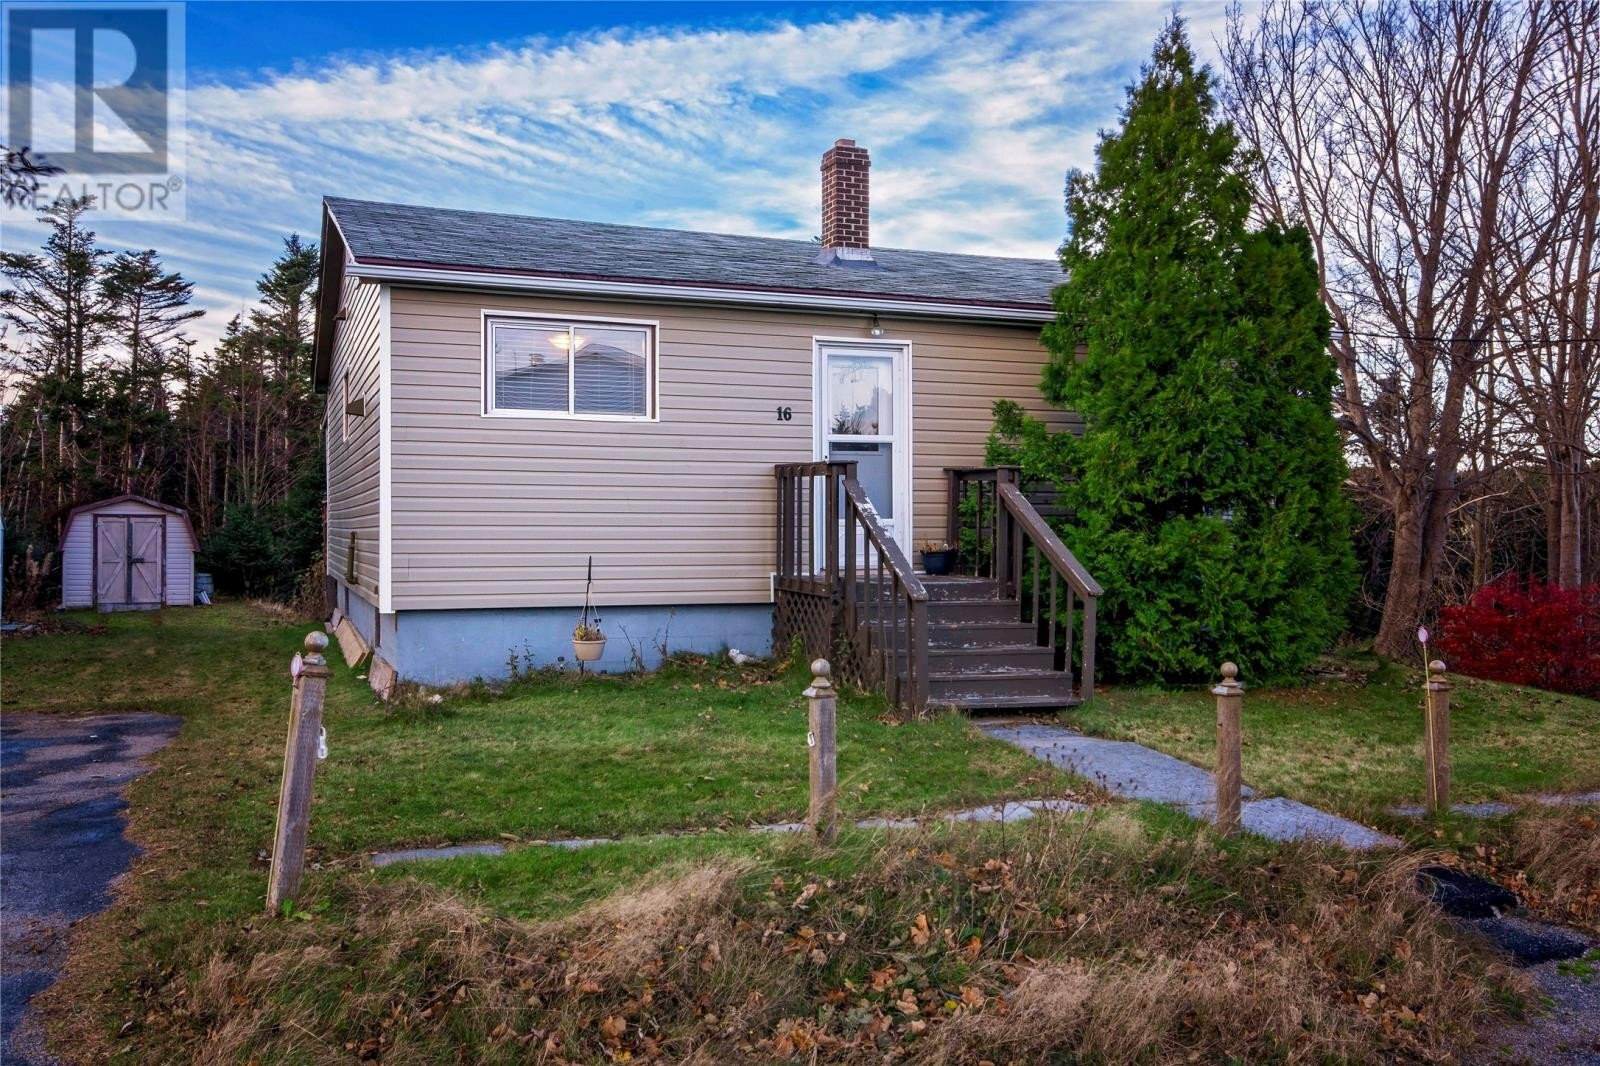 House for sale at 16 Old Flatrock Rd Flatrock Newfoundland - MLS: 1223406